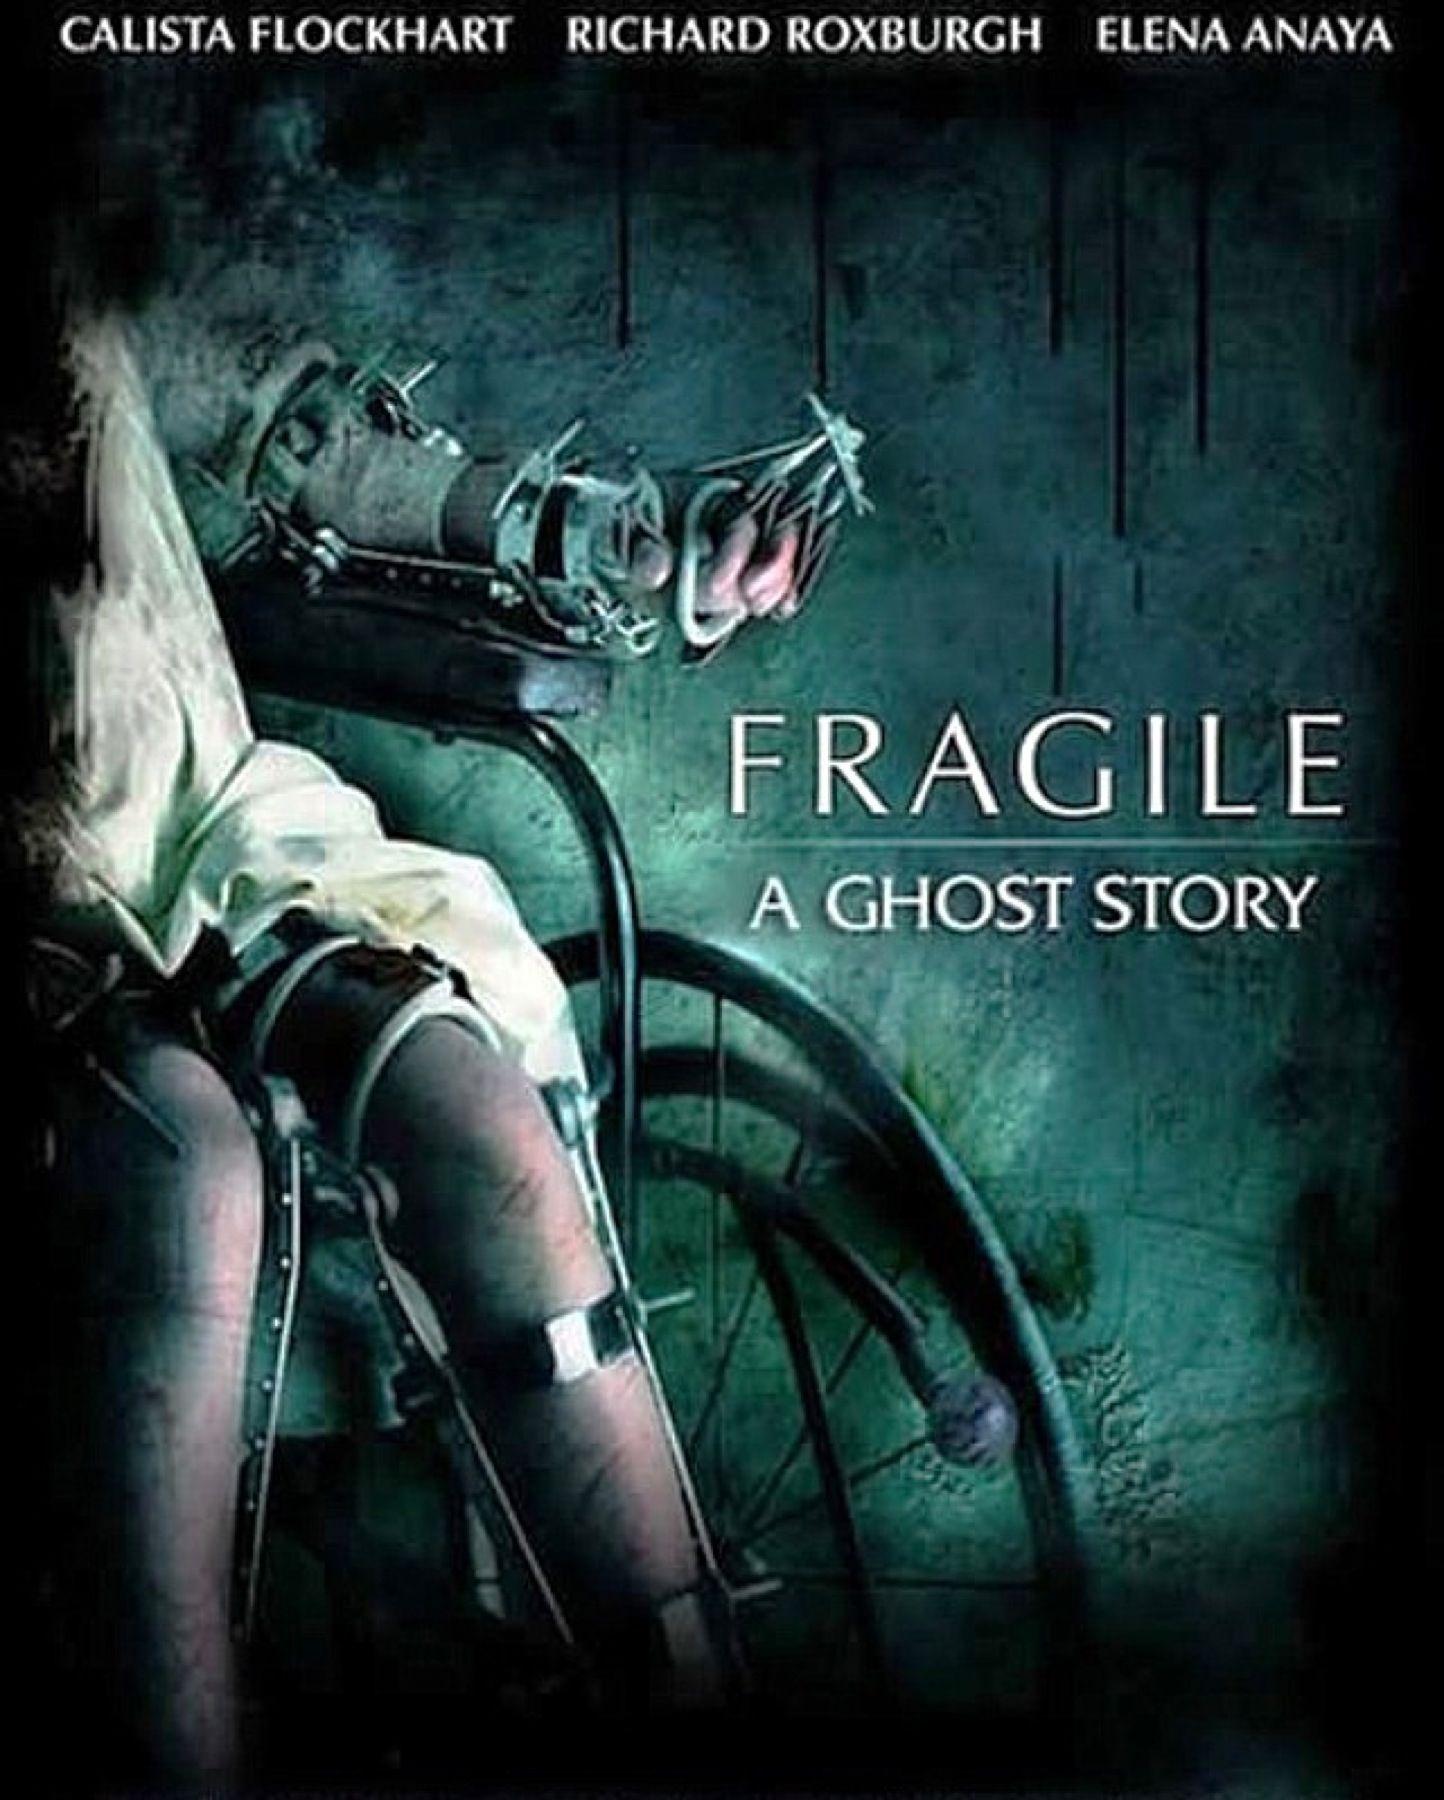 Fragile. Starring Calista Flockhart. Nice, little known